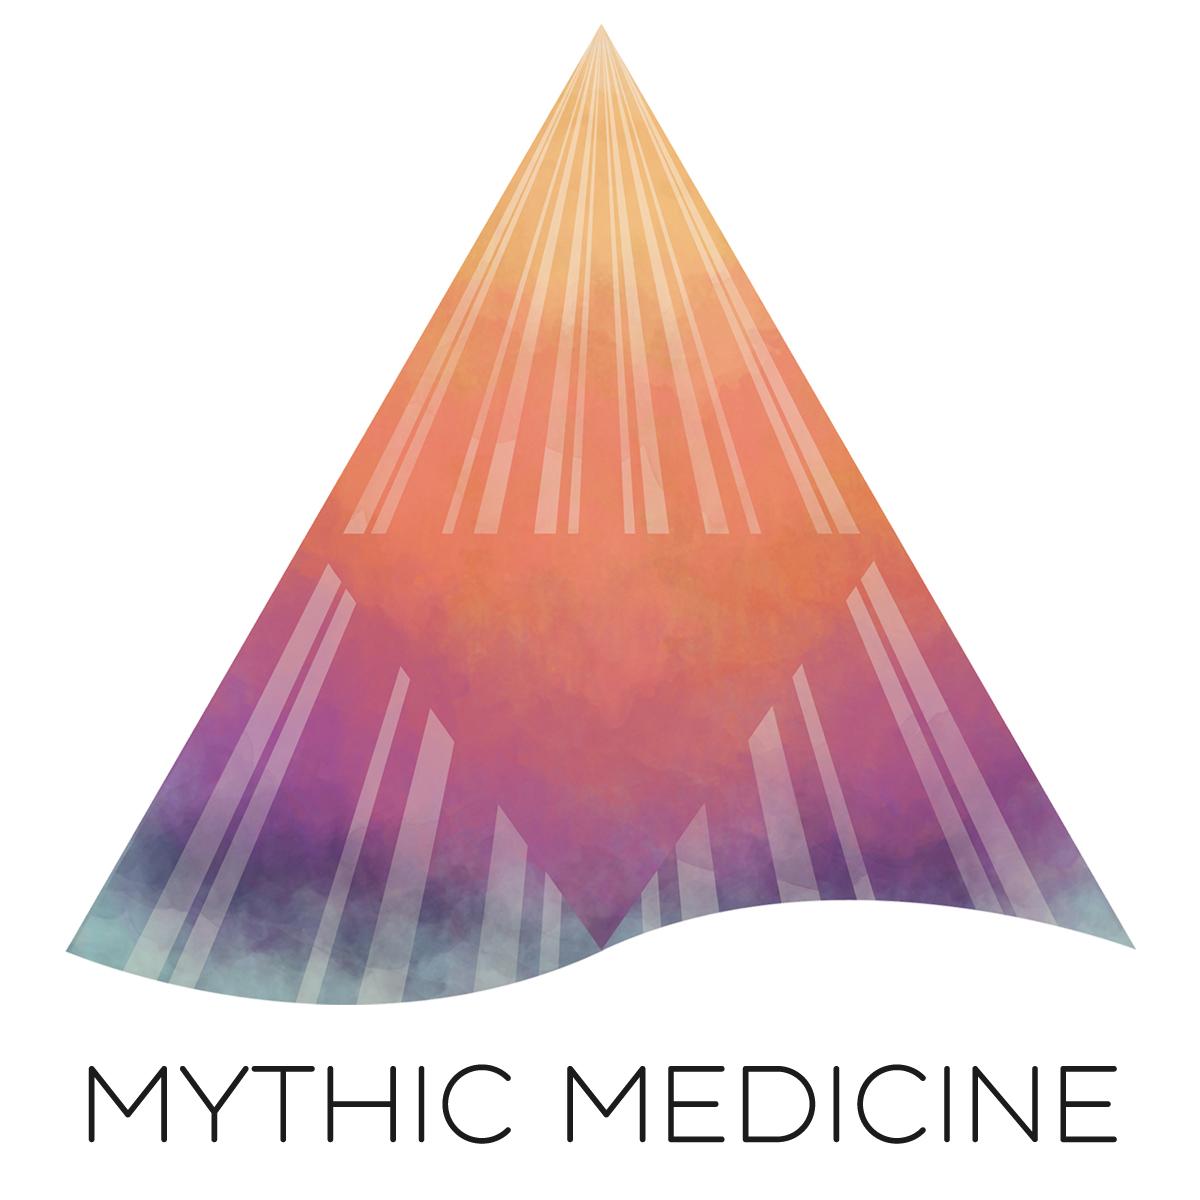 Blog — Mythic Medicine